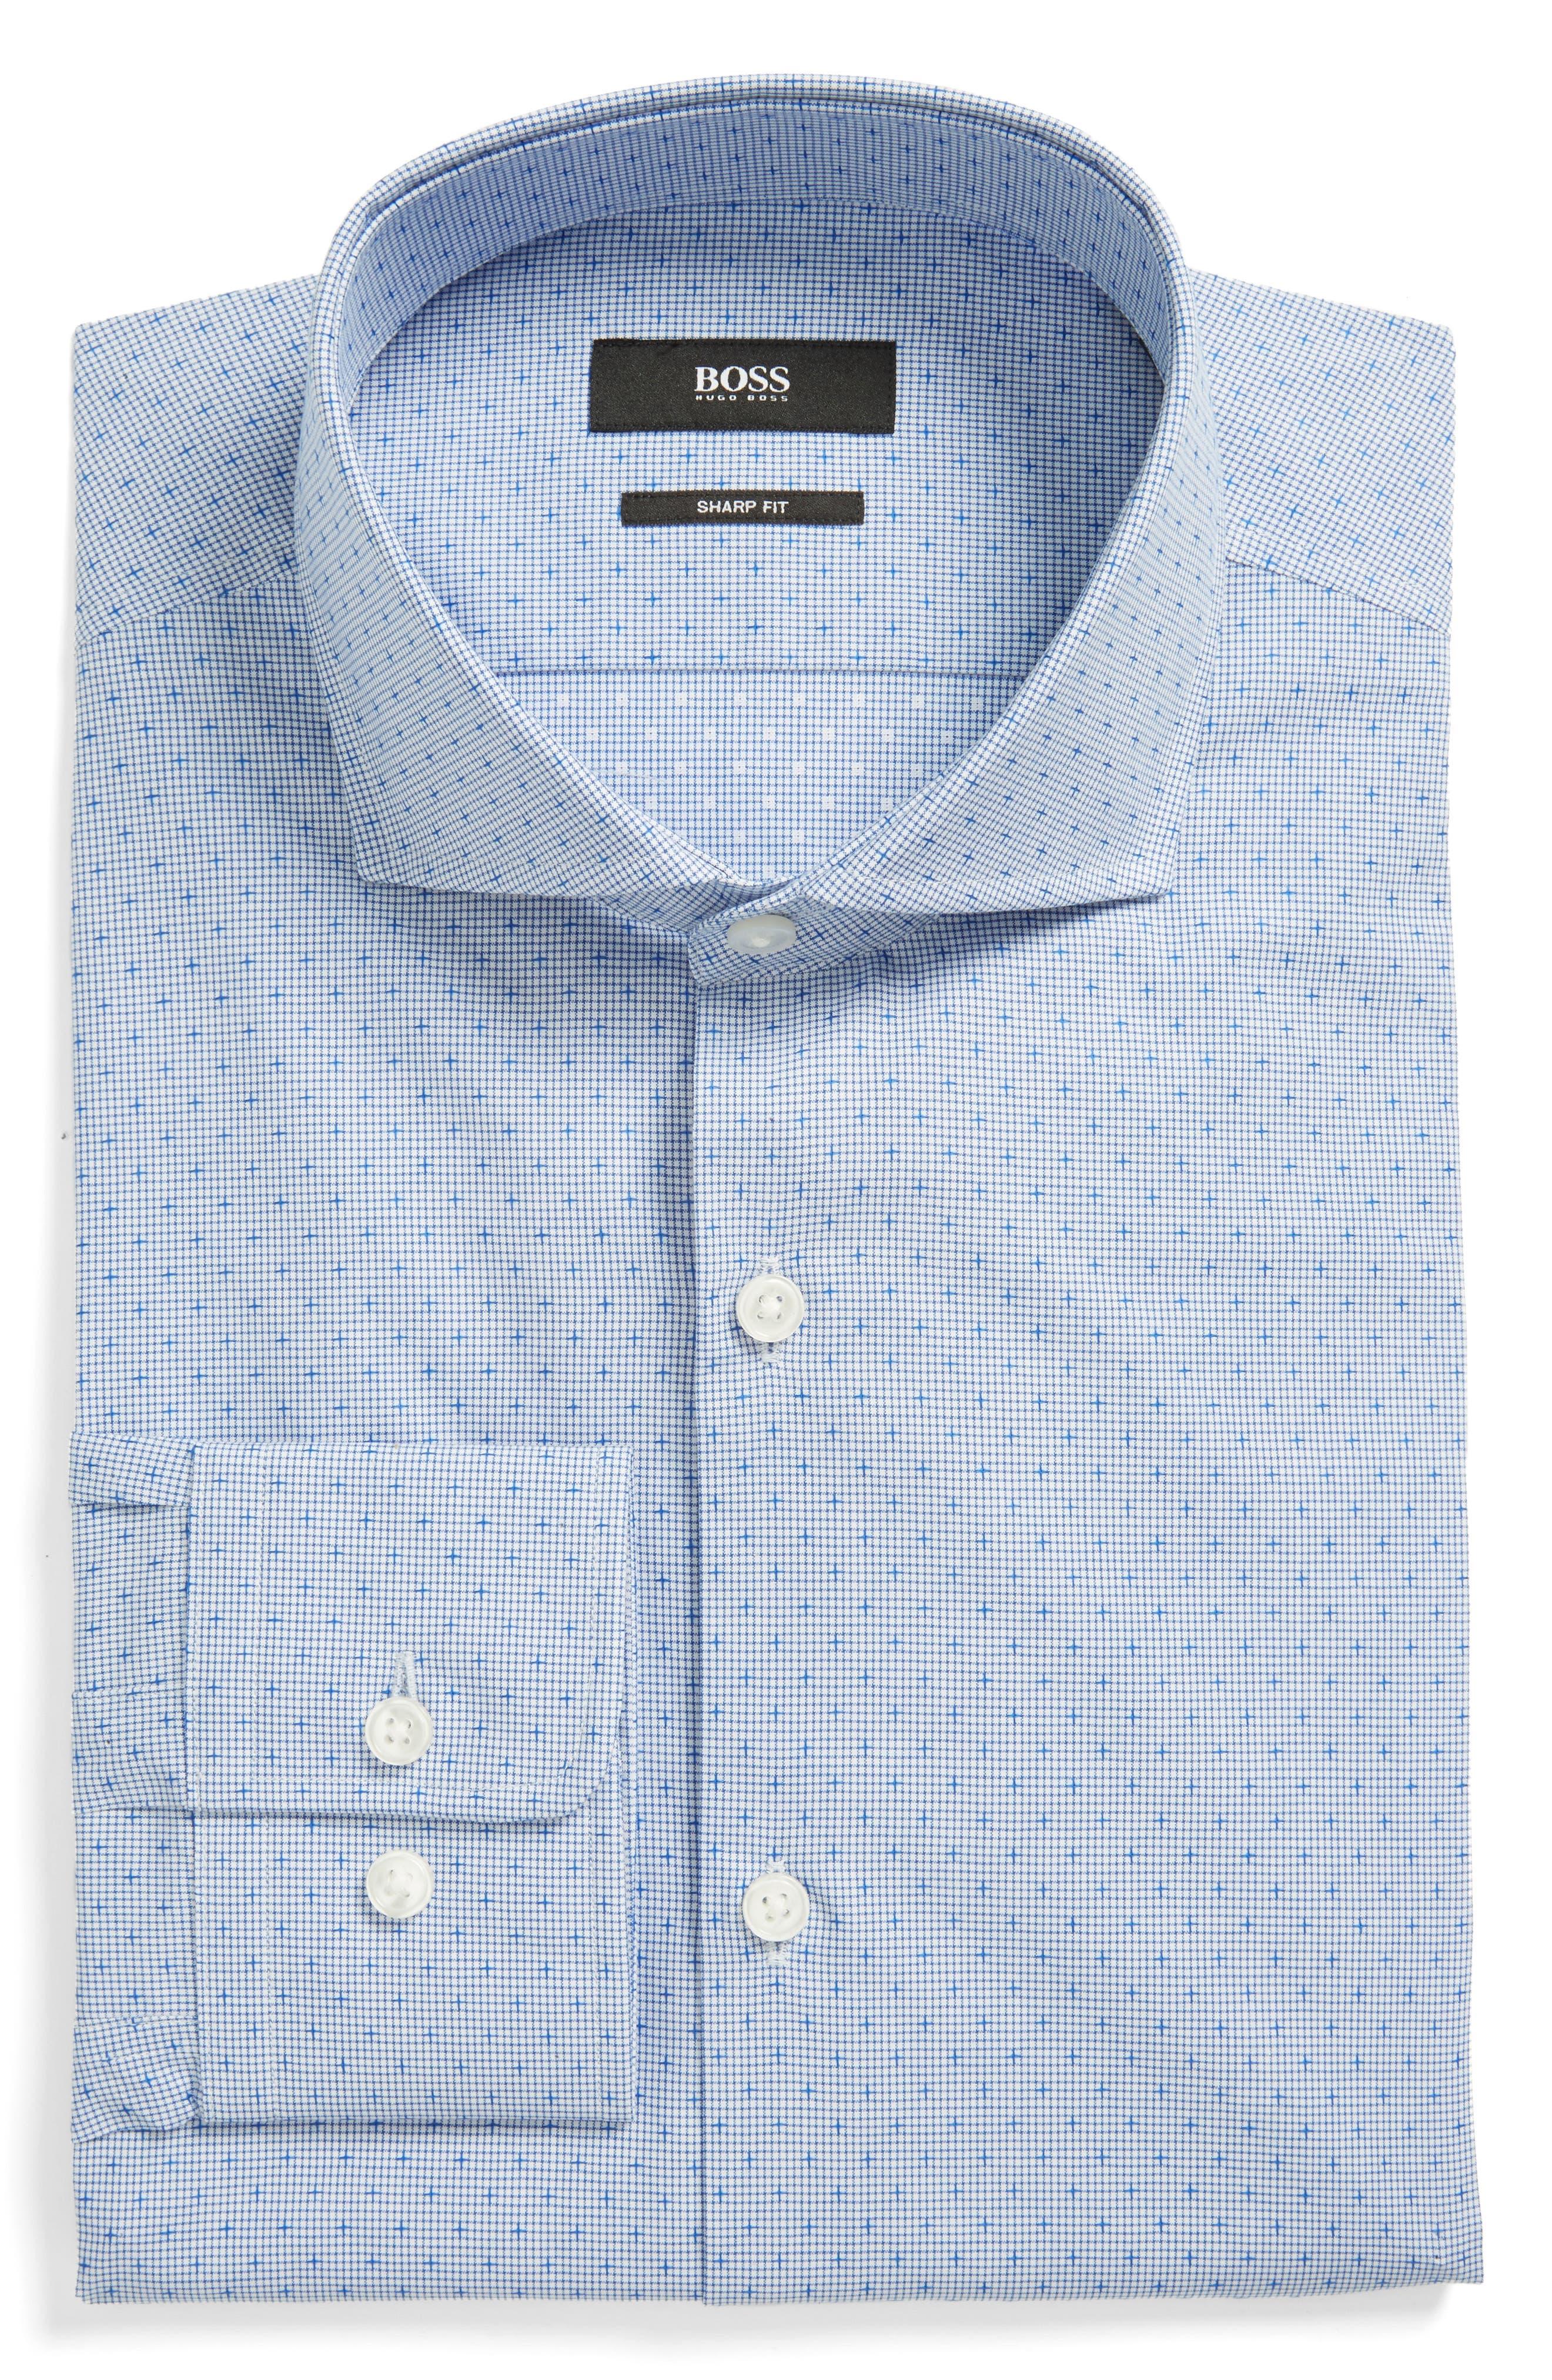 Main Image - BOSS Mark Sharp Fit Dobby Dress Shirt